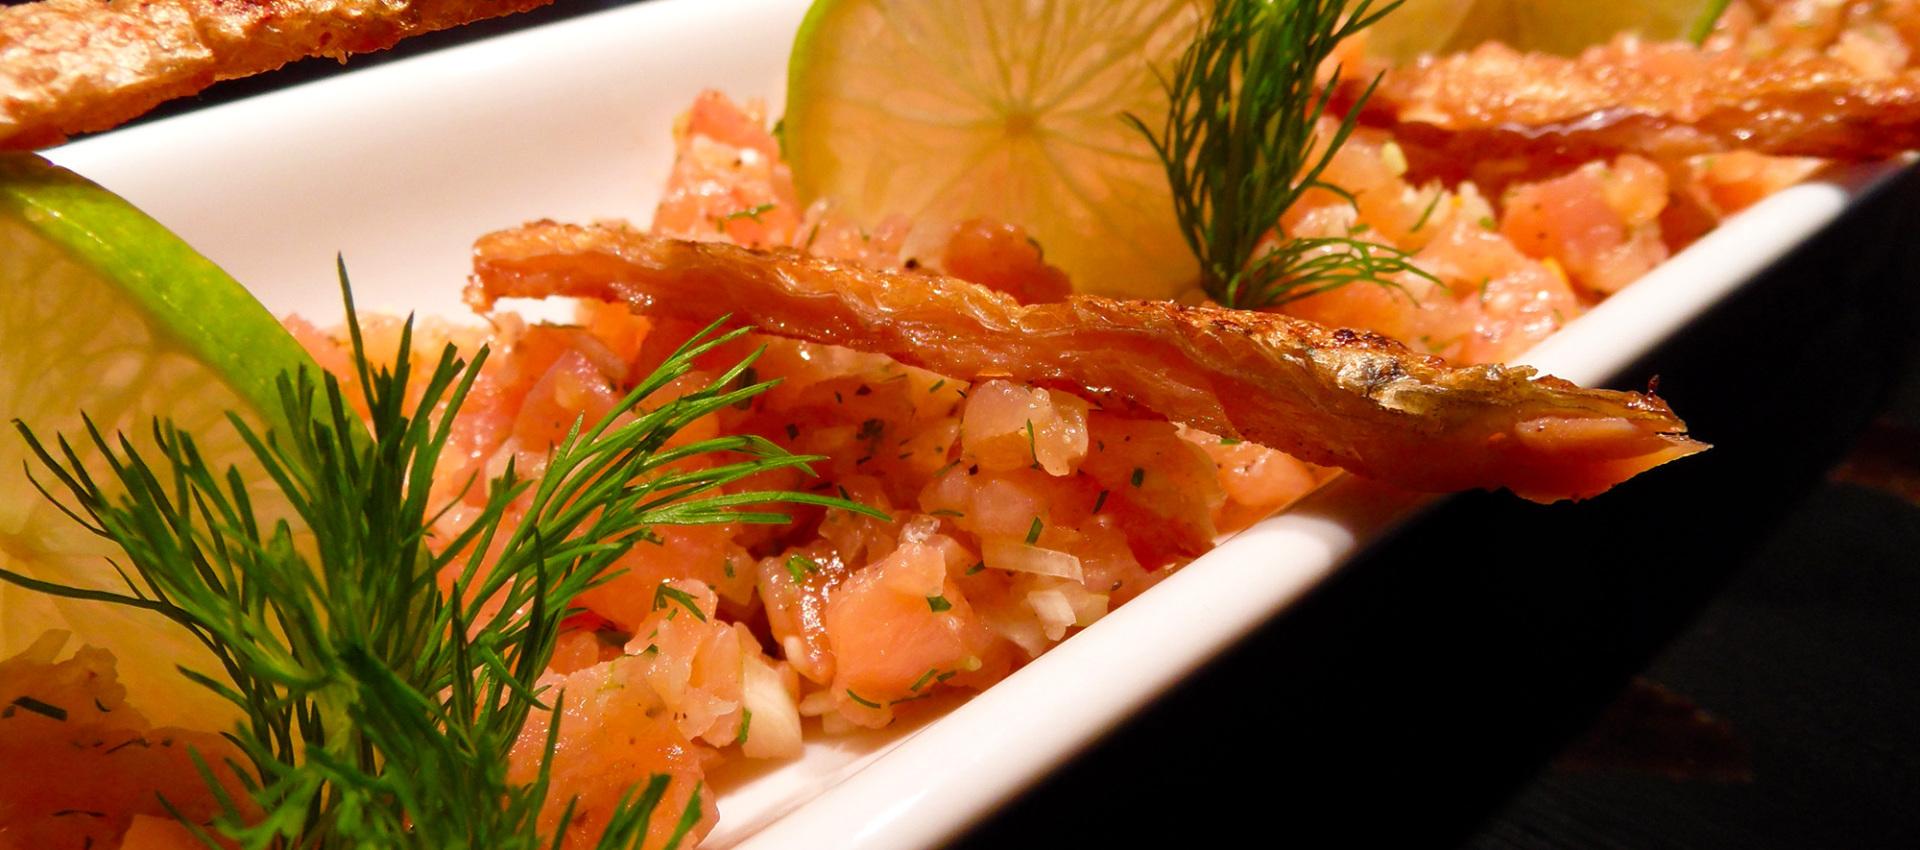 Rezept Lachs Tatar mit Limetten & gebratener Lachshaut - Kochbock.de